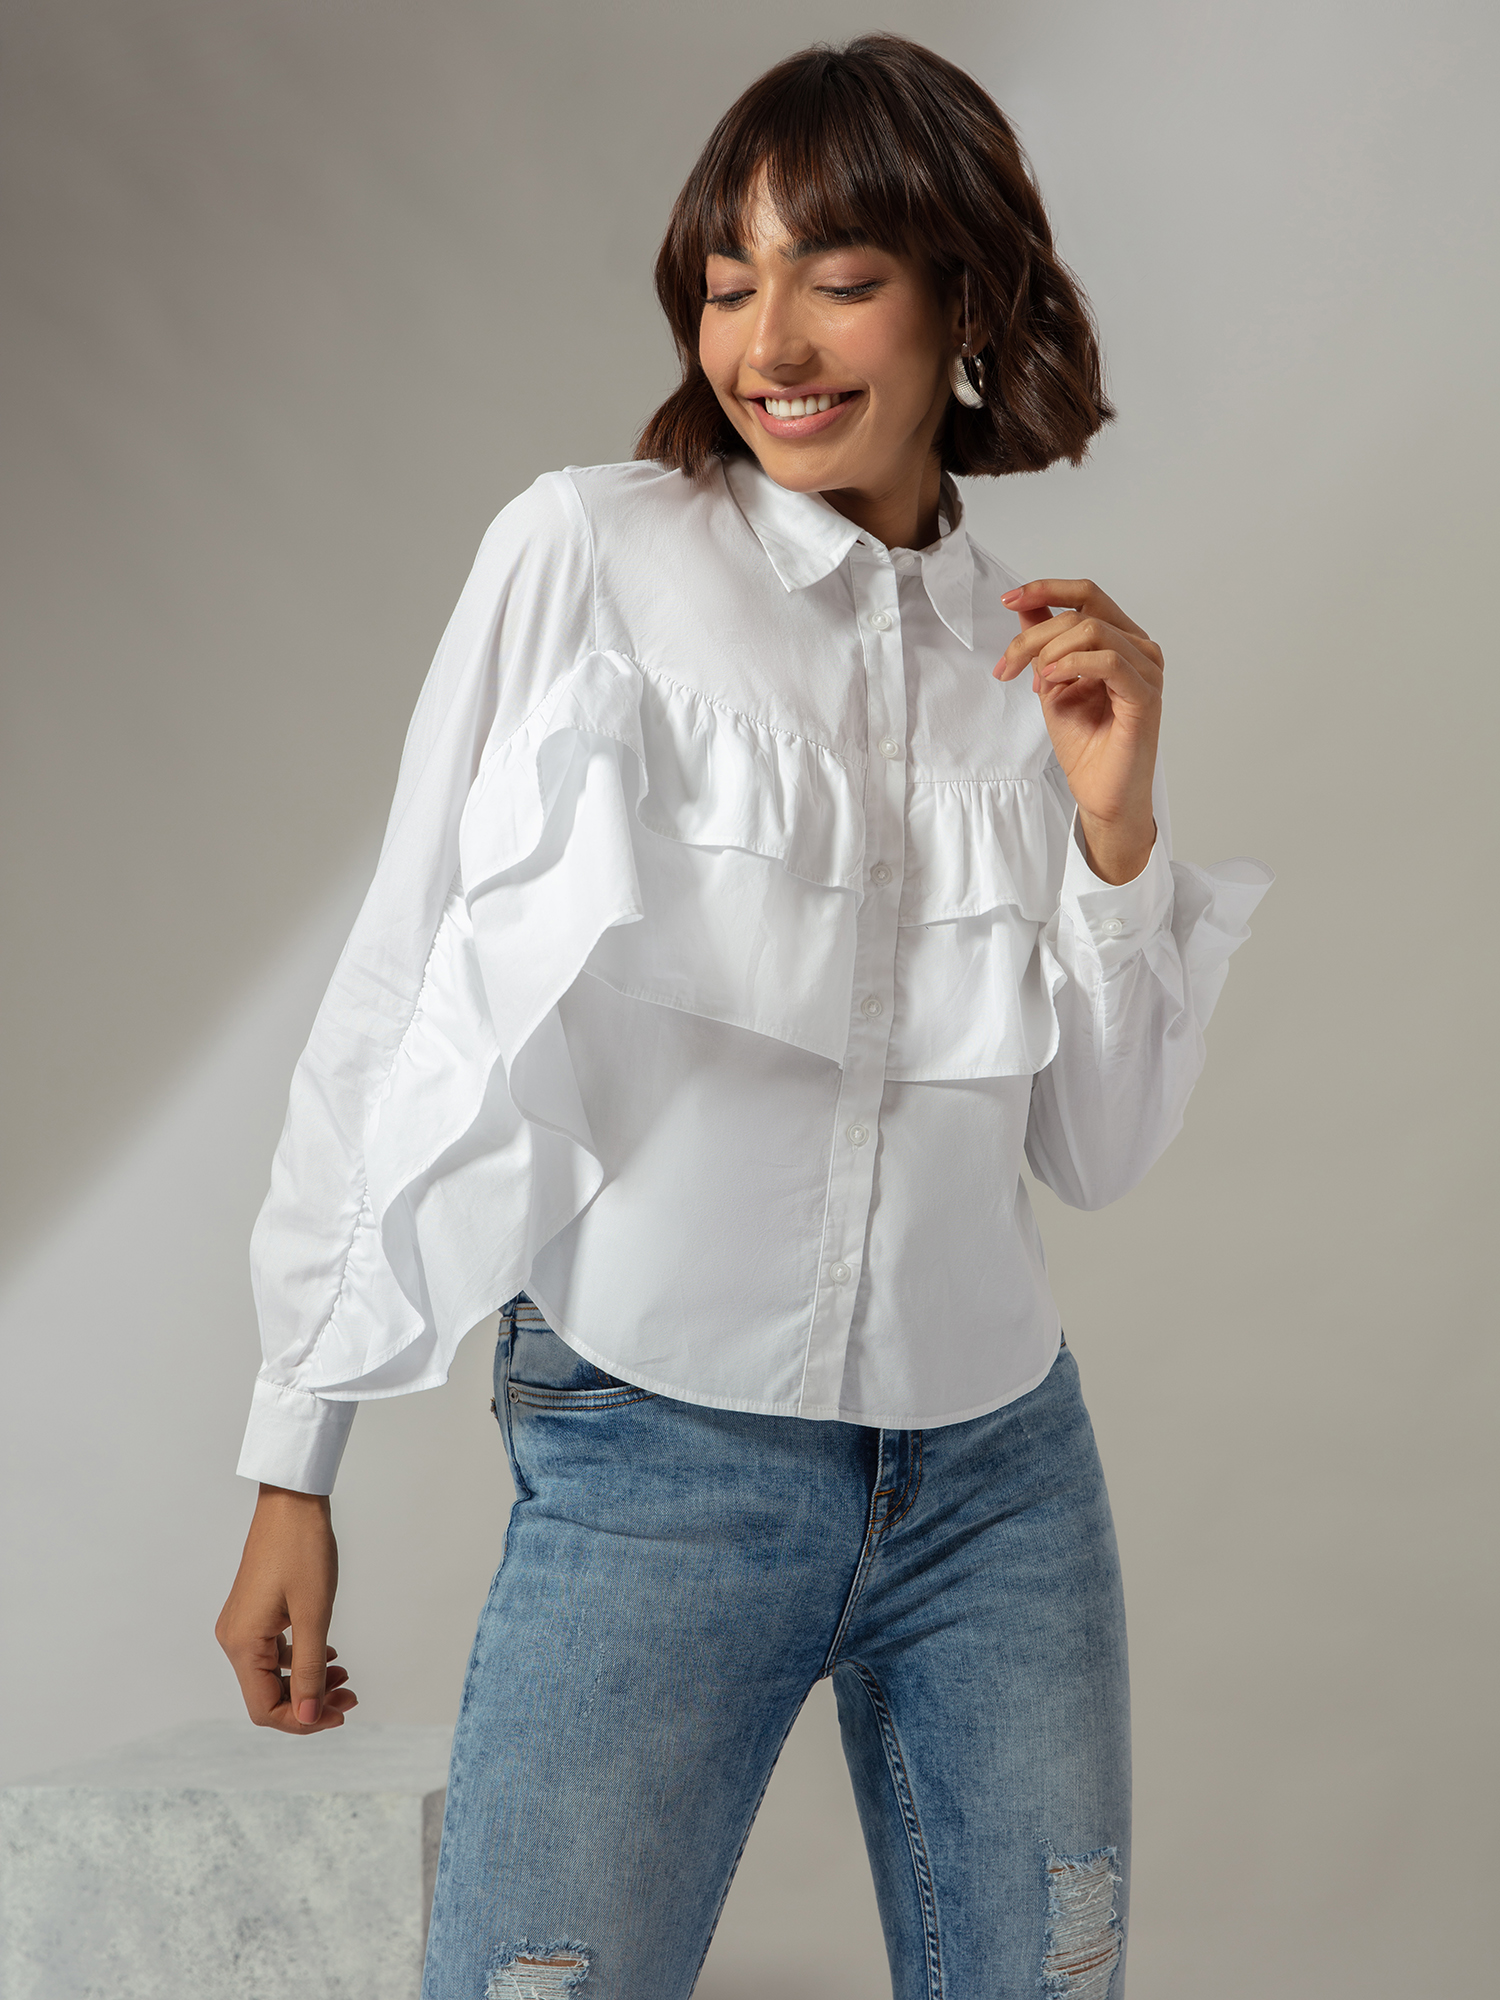 Tops-Ruffle This Way Again Shirt4